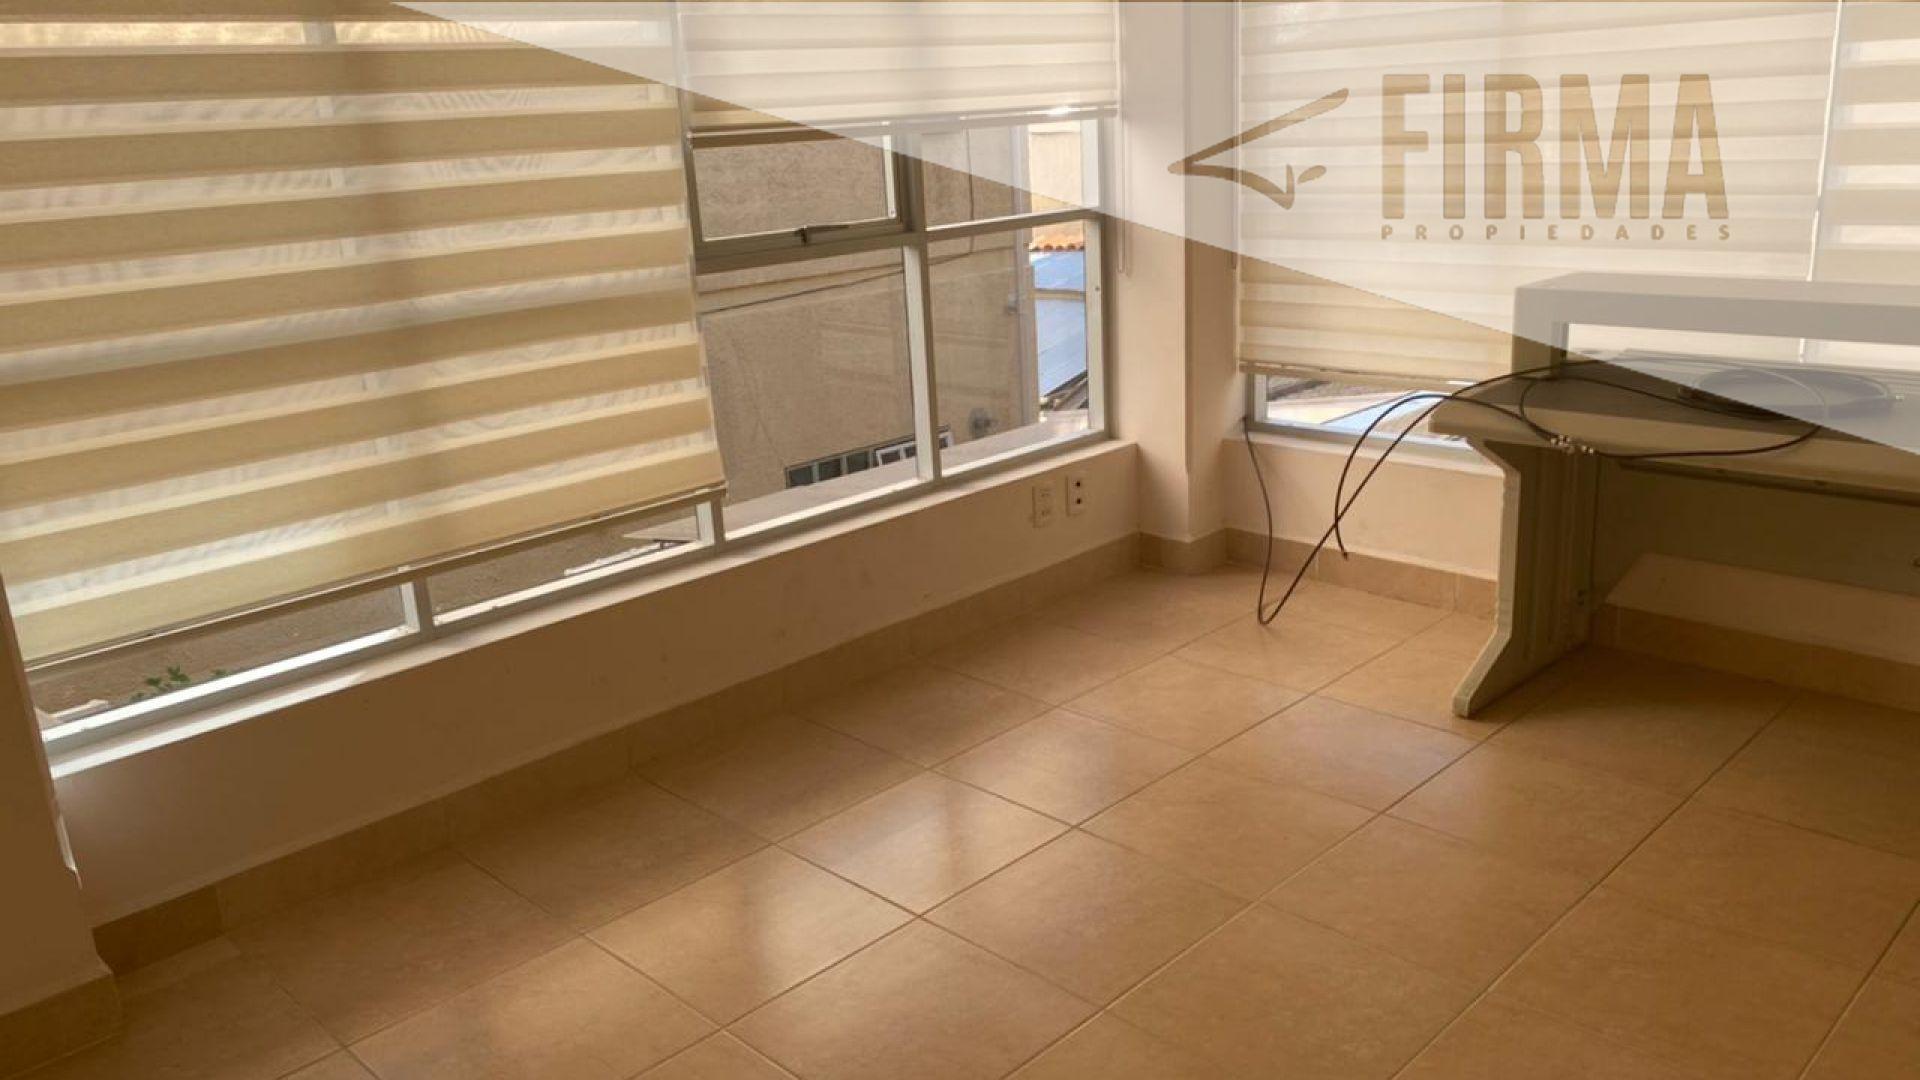 Oficina en Alquiler ALQUILA ESTA OFICINA EN CALACOTO Foto 1